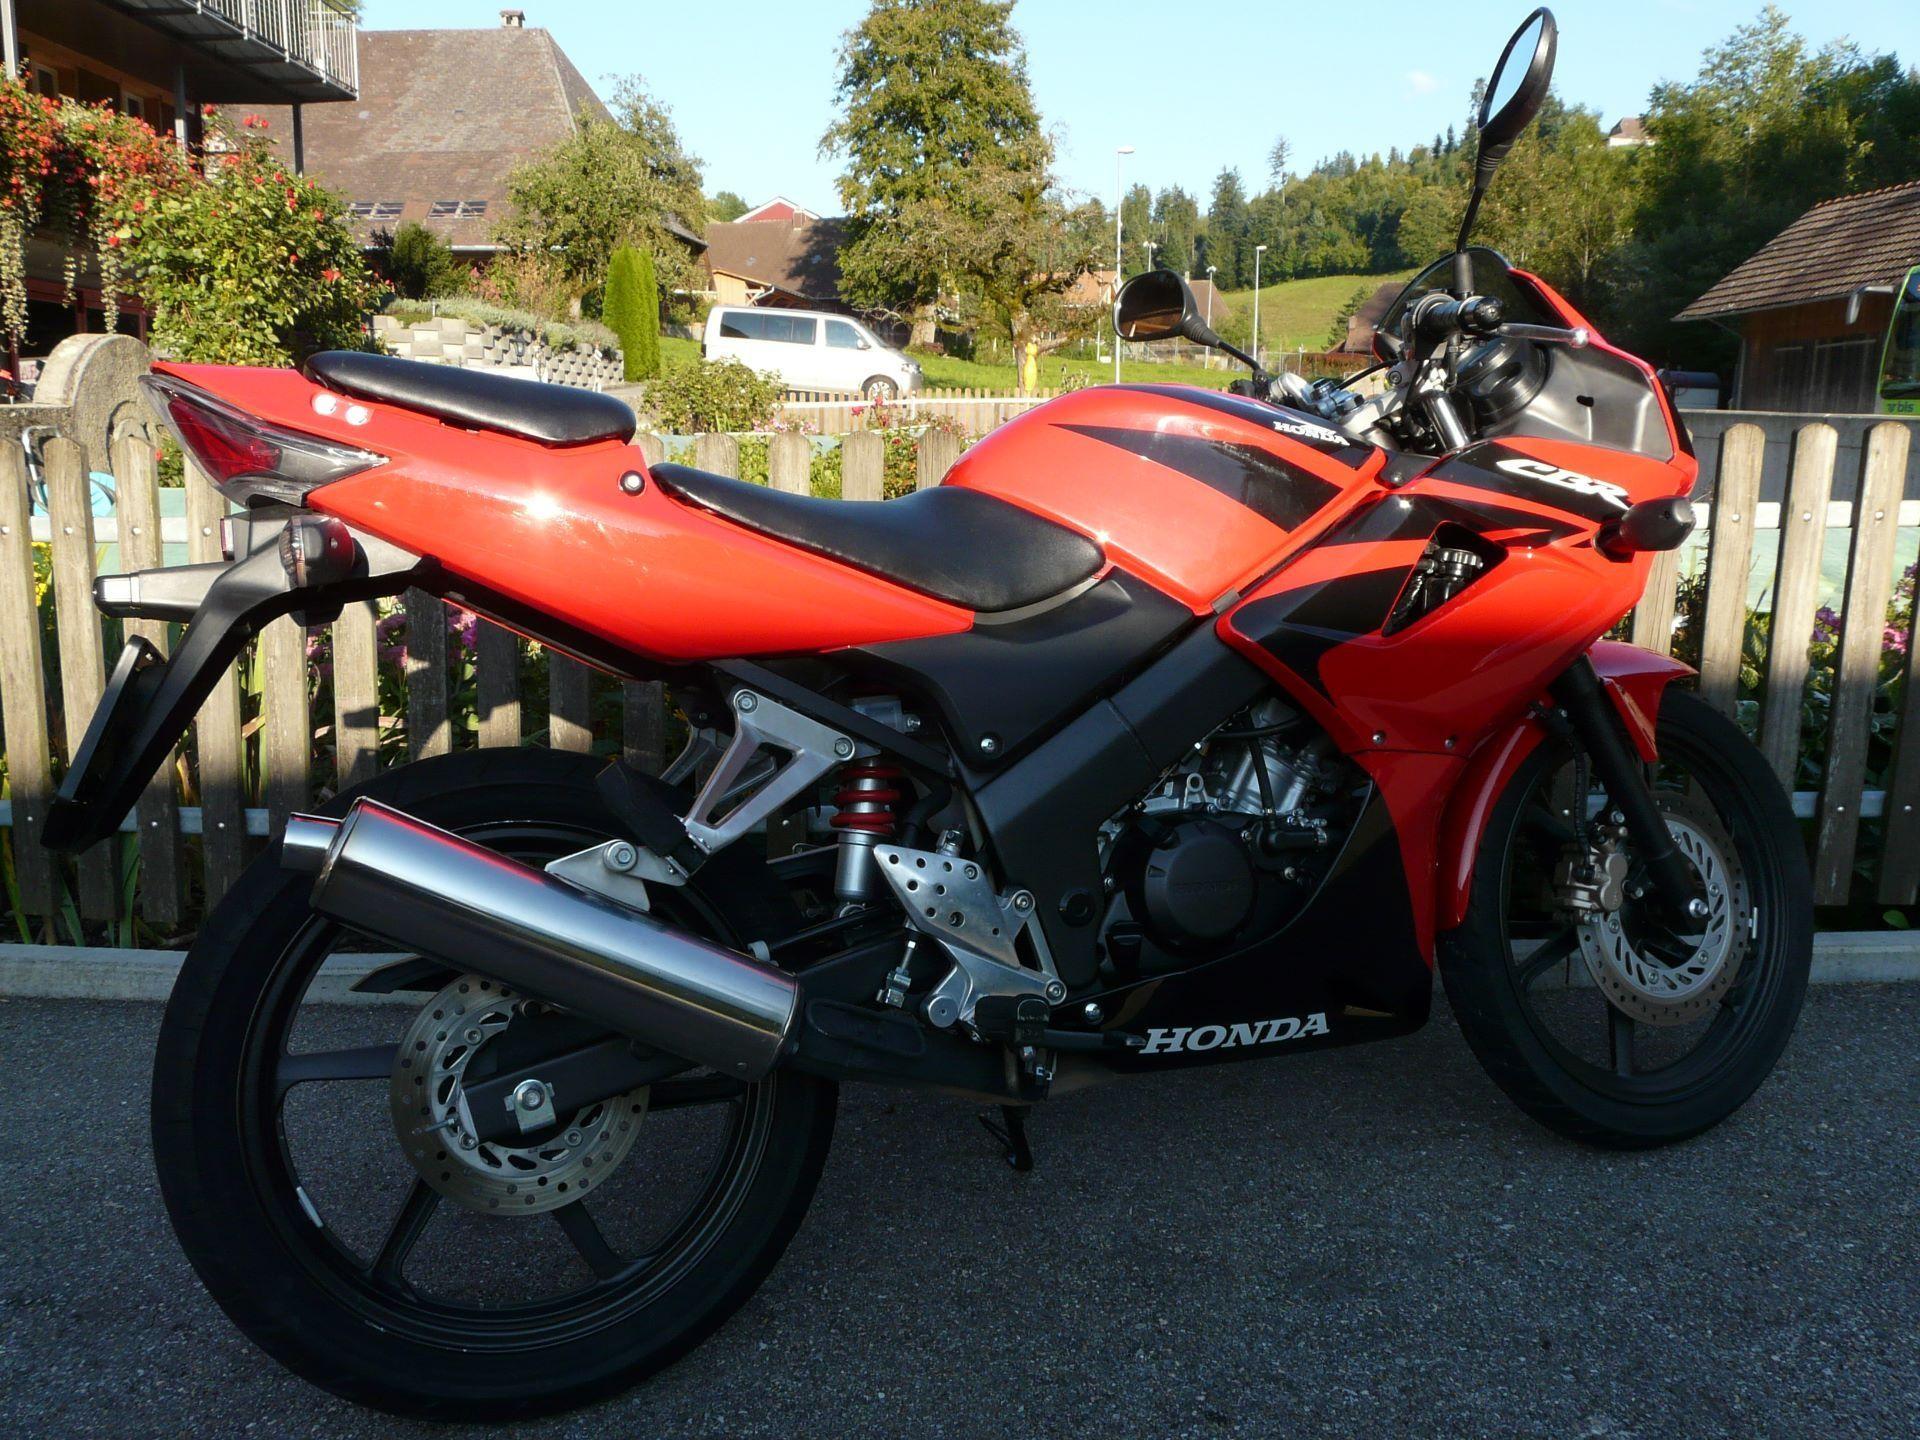 motorrad occasion kaufen honda cbr 125 r fuhrer moto heimisbach. Black Bedroom Furniture Sets. Home Design Ideas